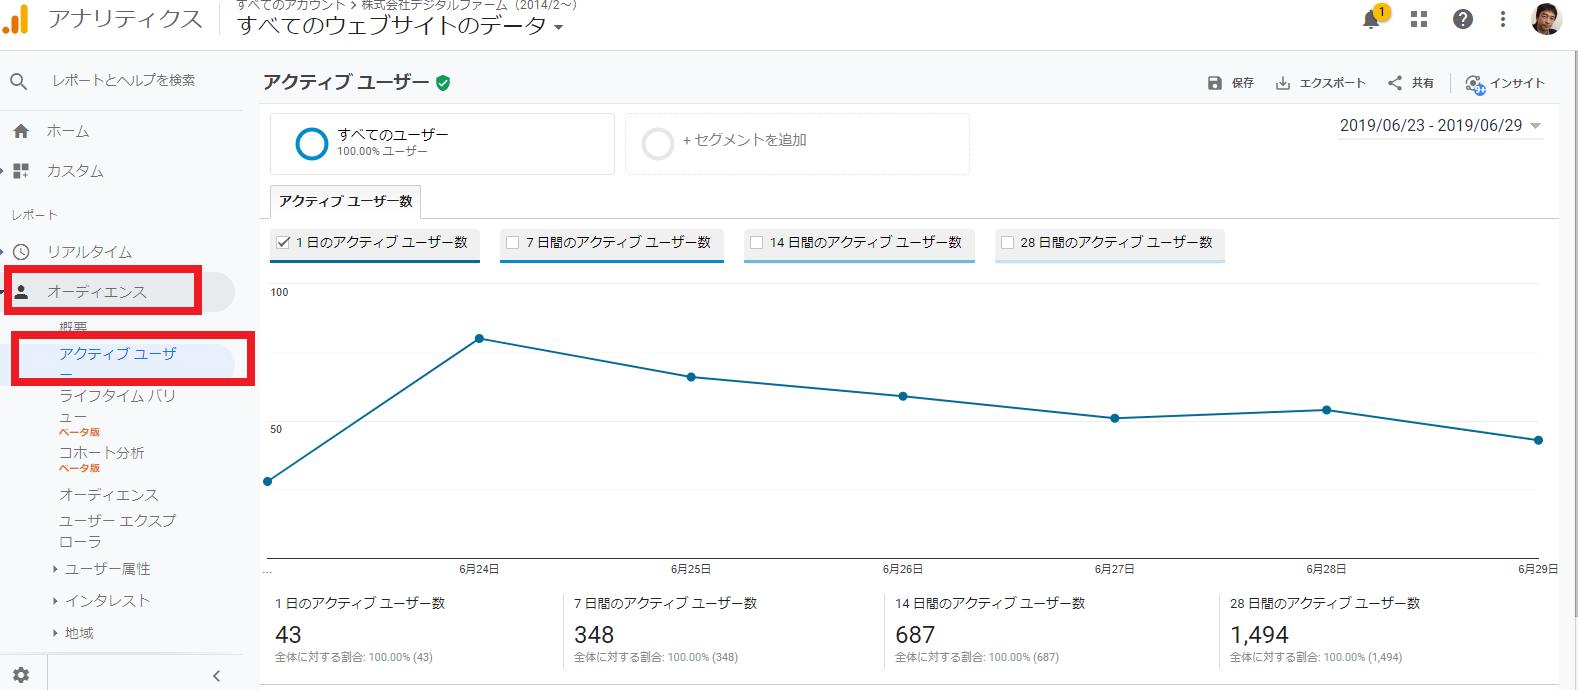 Webサイトの顧客満足度はGoogleアナリティクスでアクティブユーザーを測ればわかる!